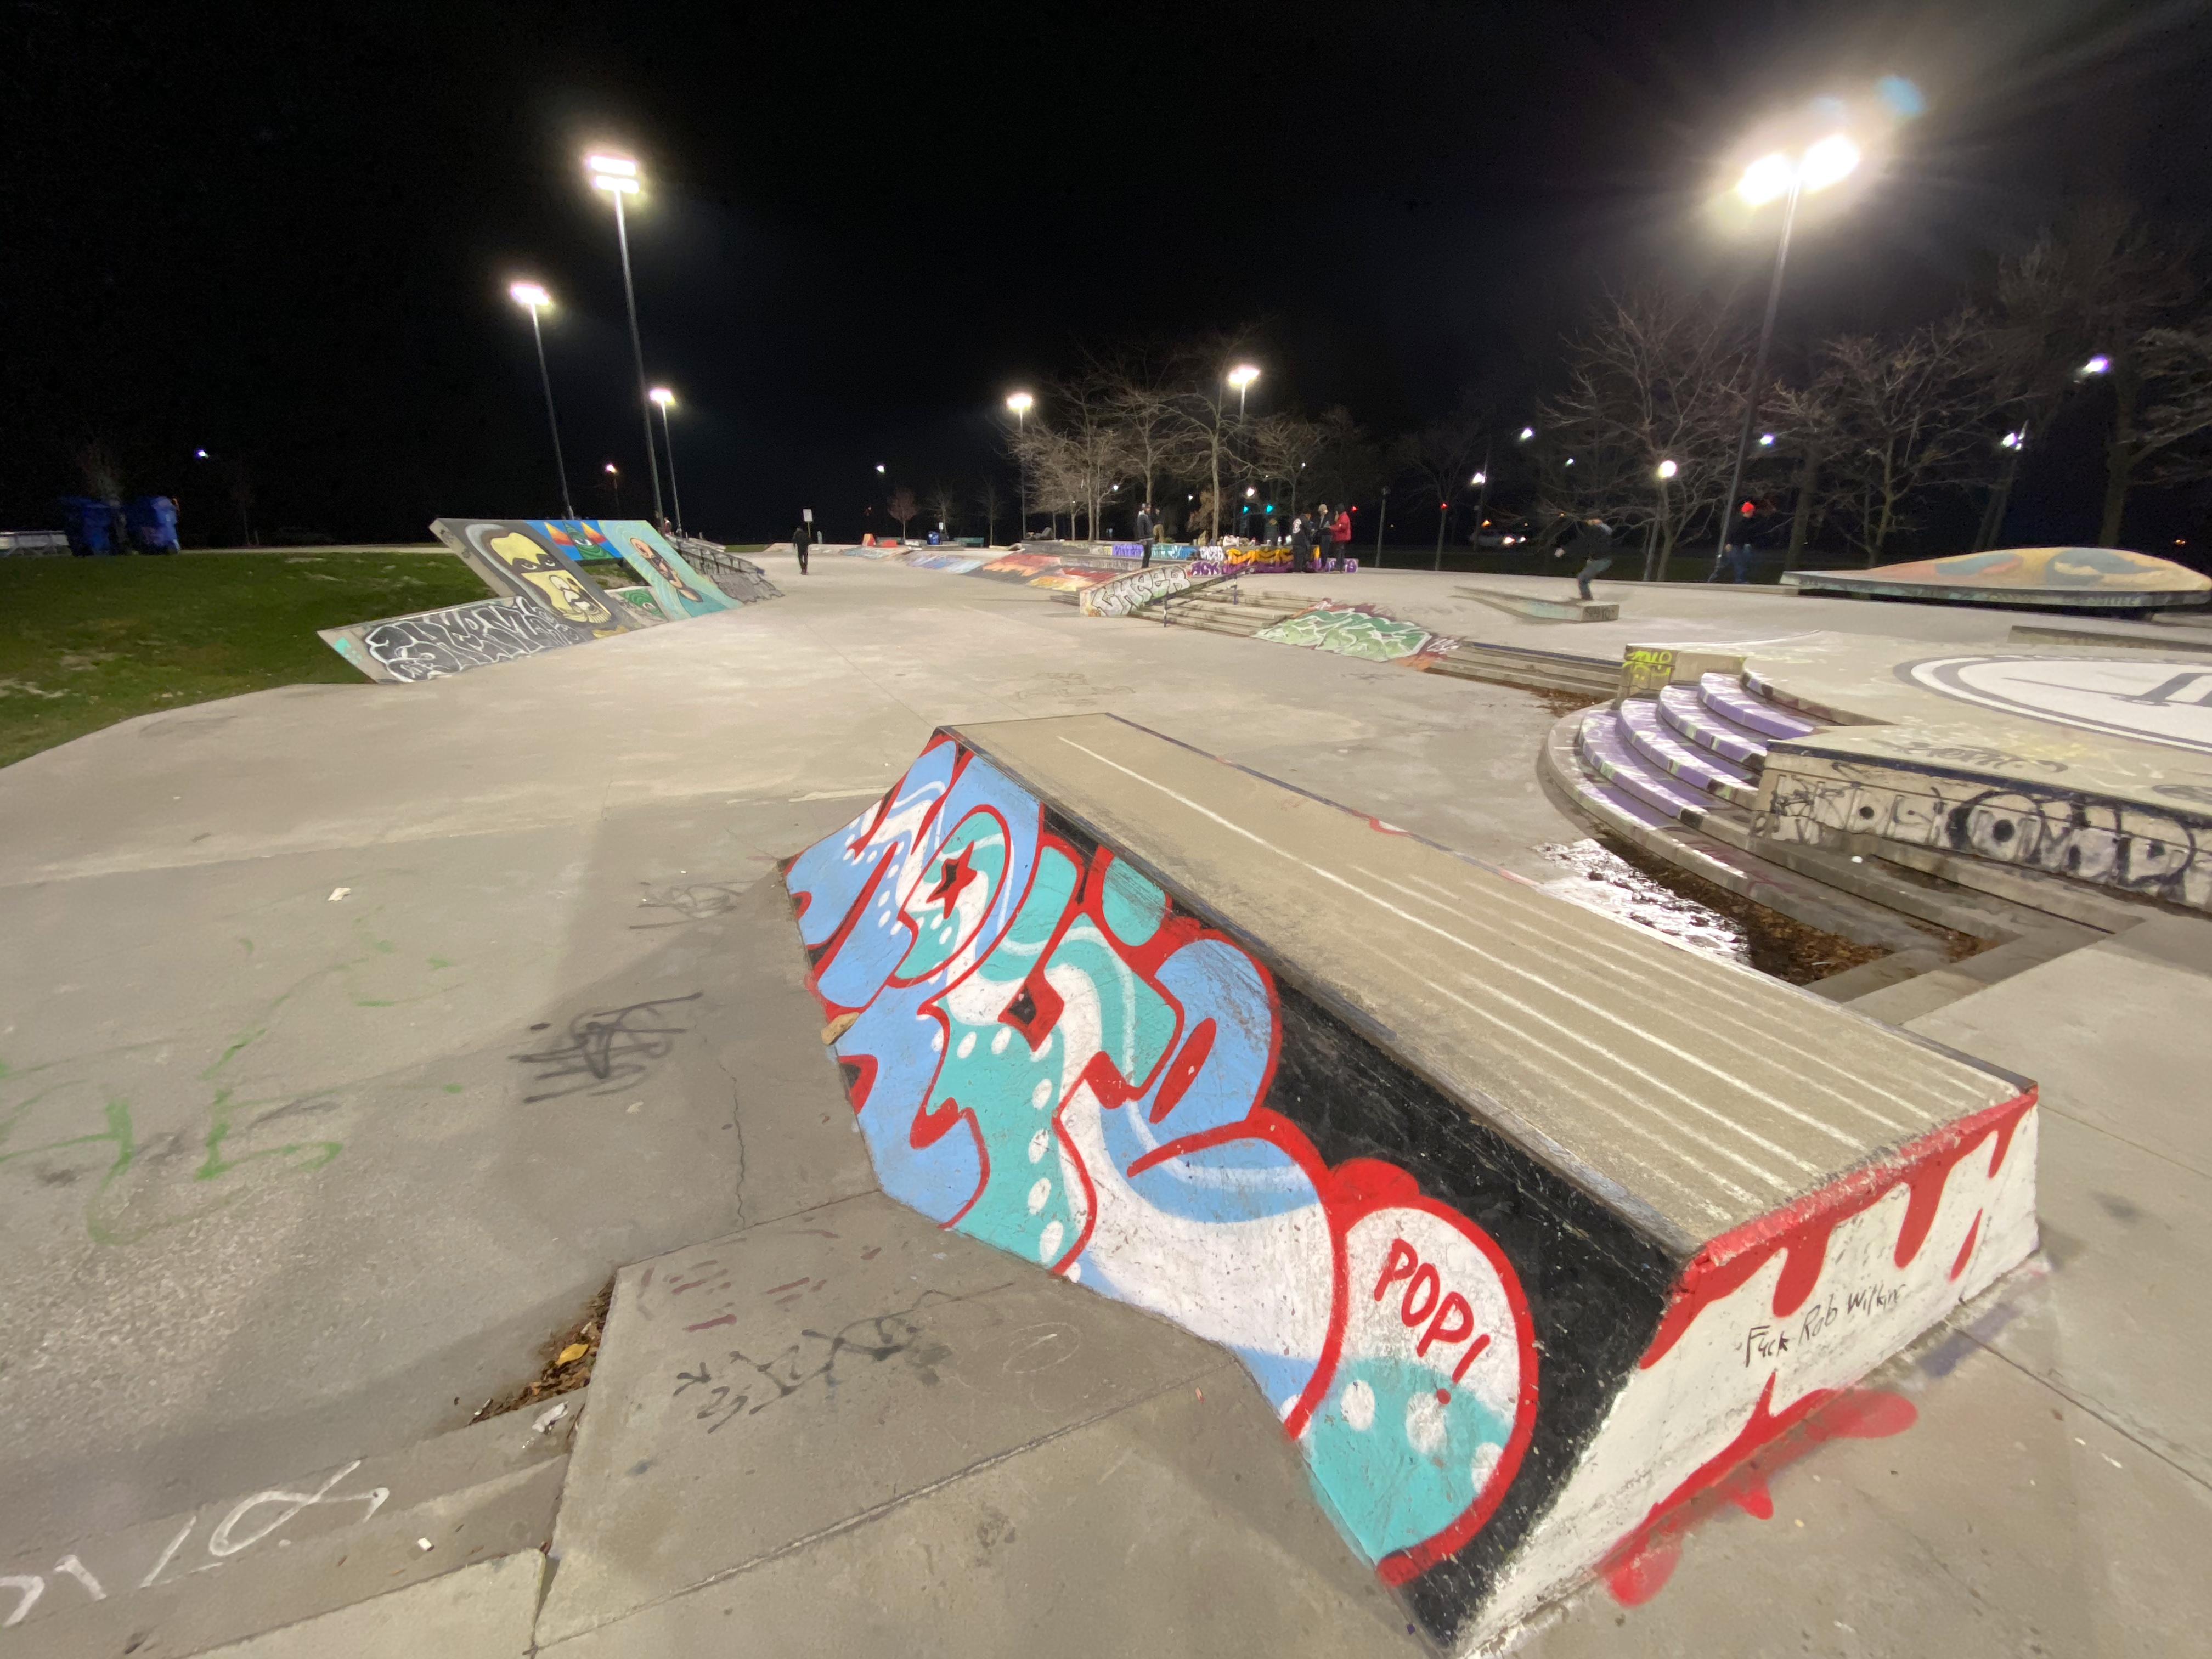 Toronto Beaches skatepark at night